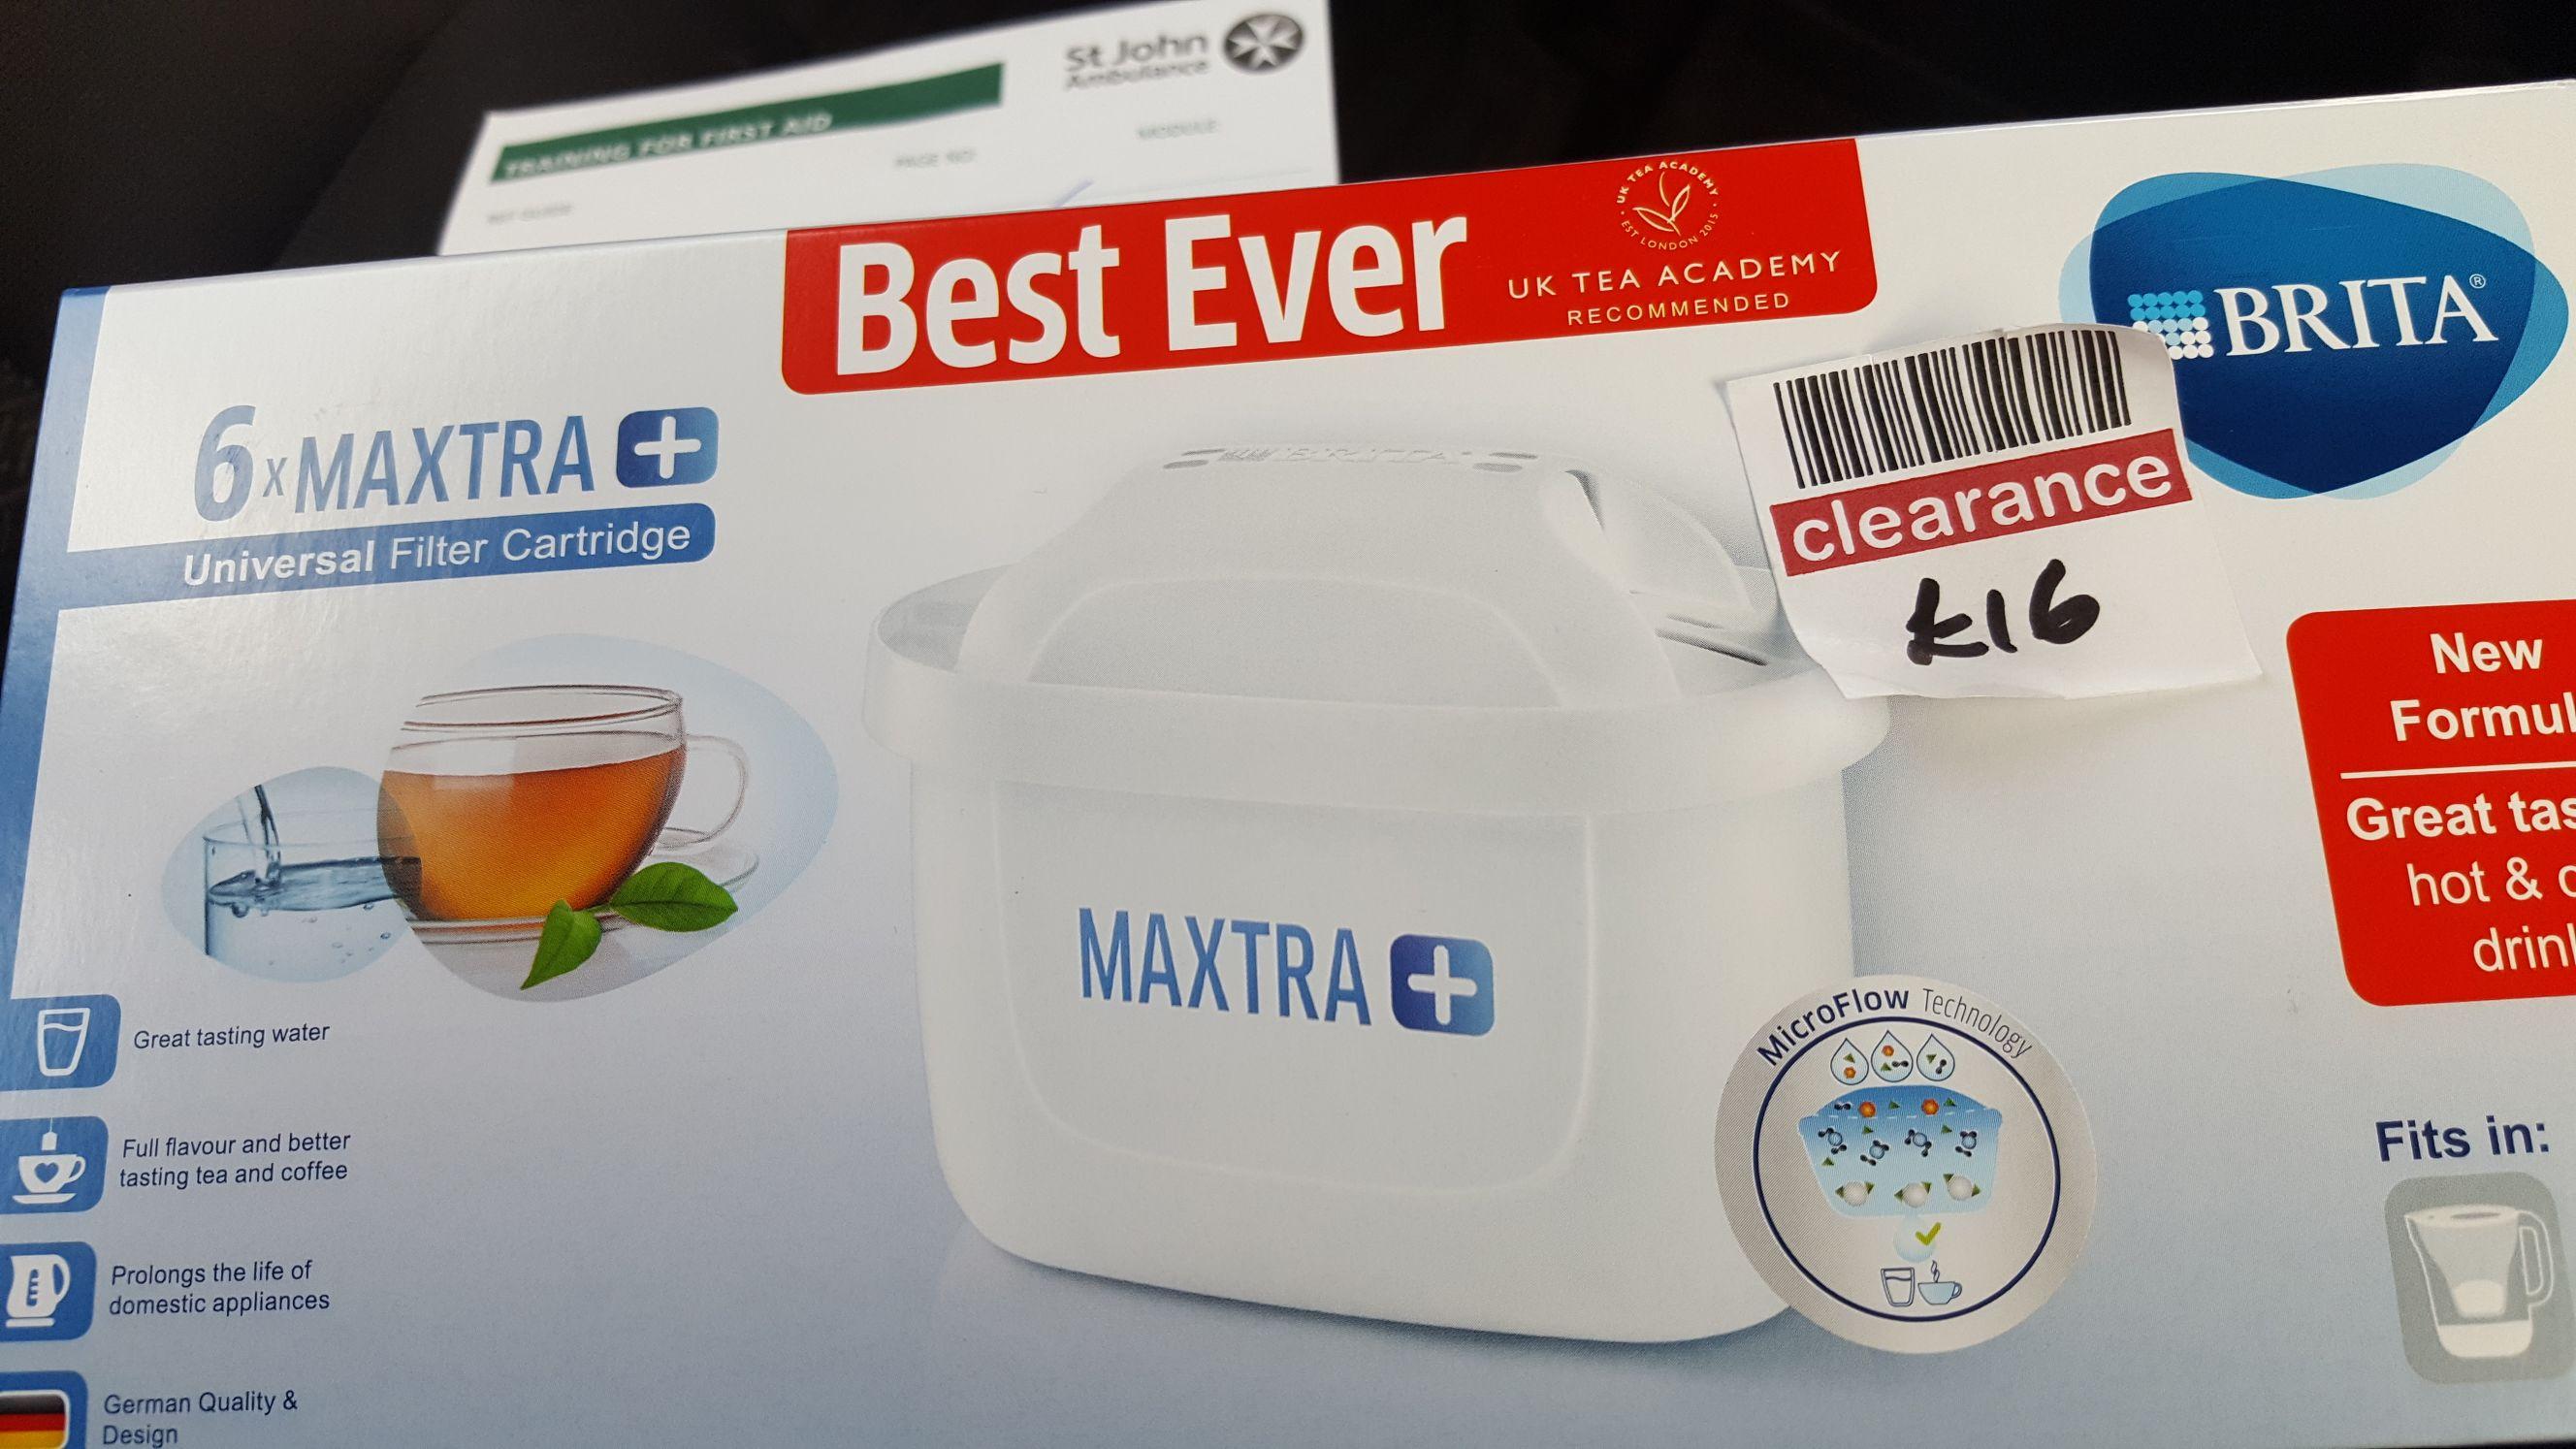 6 water filter cartridges. Maxtra +. Boots in store @ Harrow wealdstone £10.66